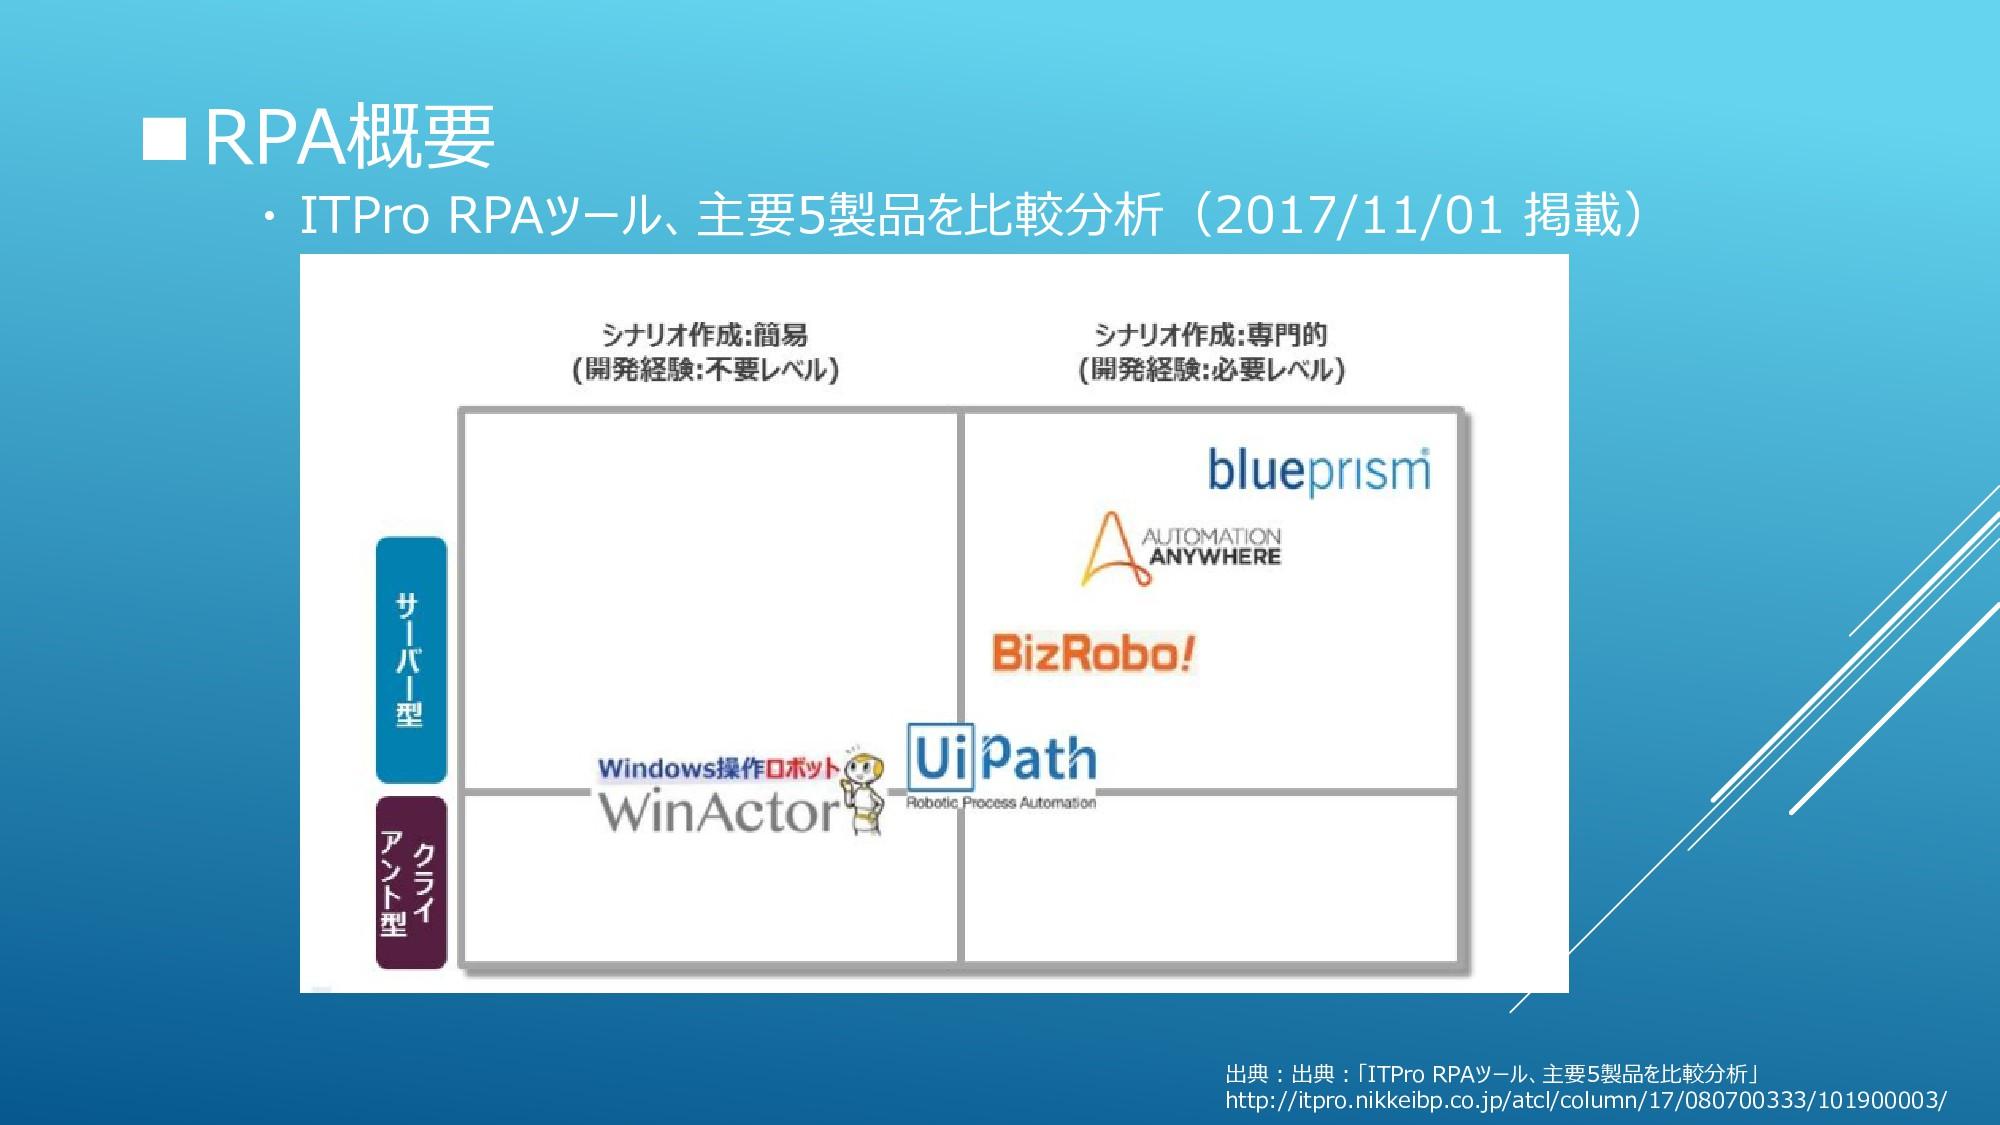 ■RPA概要 ・ ITPro RPAツール、主要5製品を比較分析(2017/11/01 掲載)...